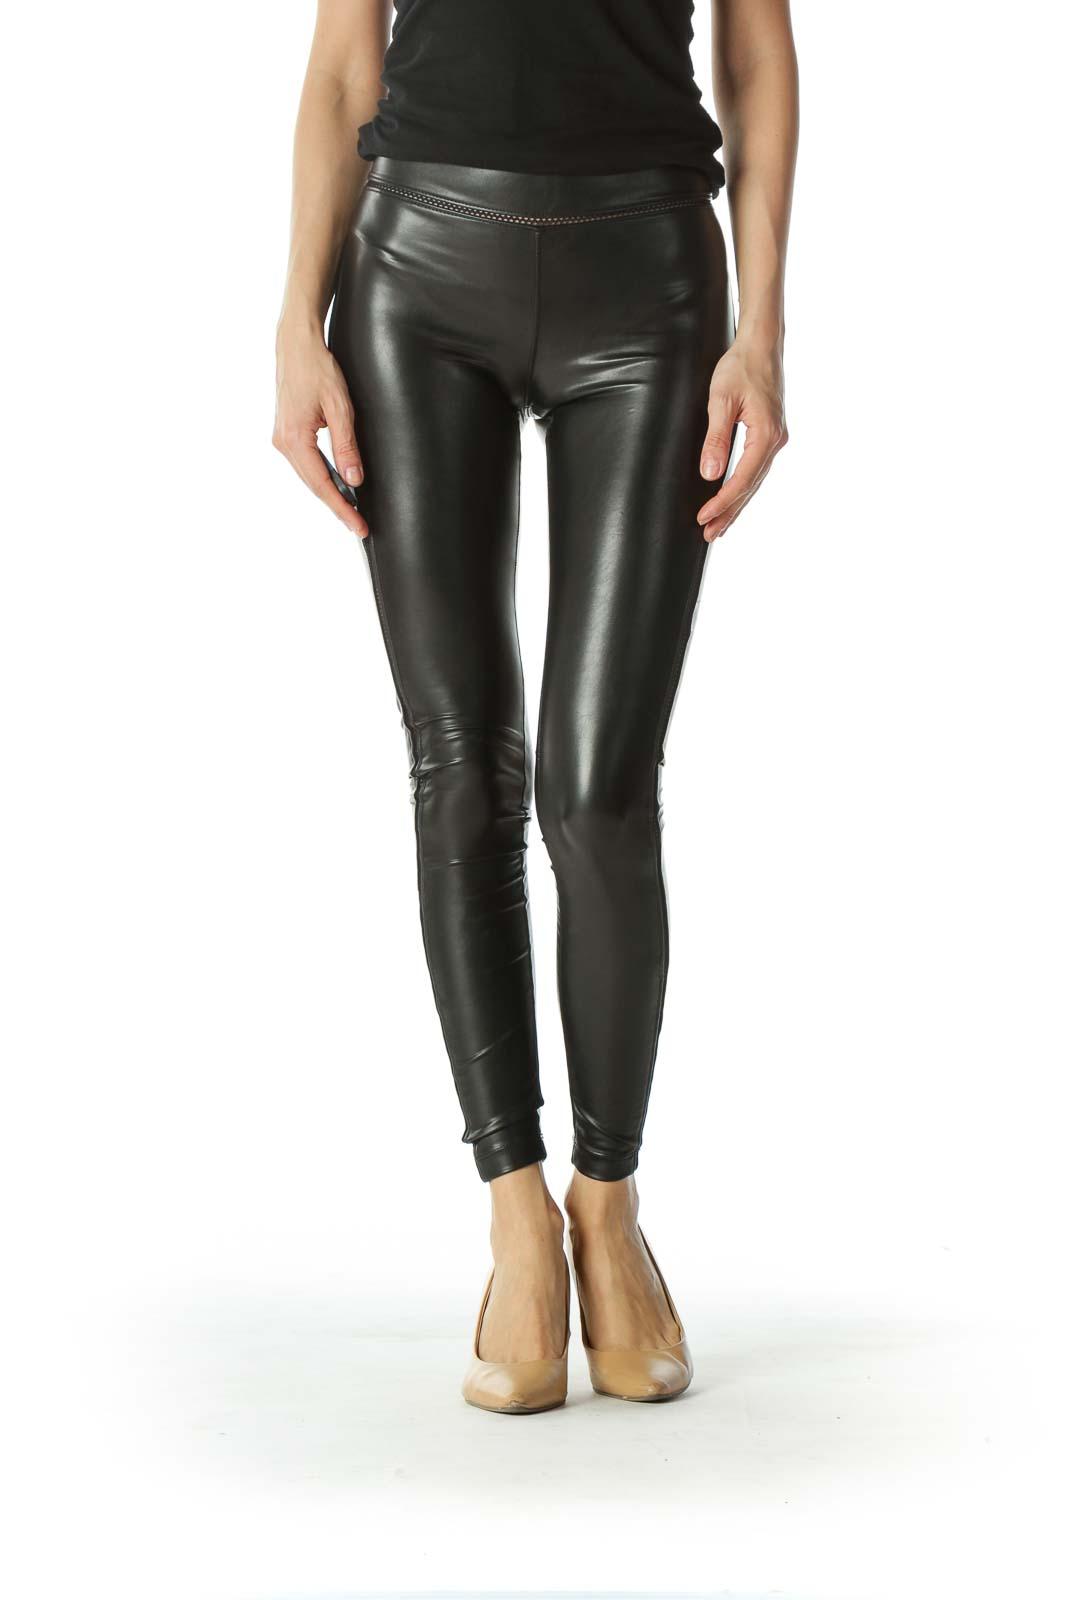 Black Mesh Detailed Leather Legging Front